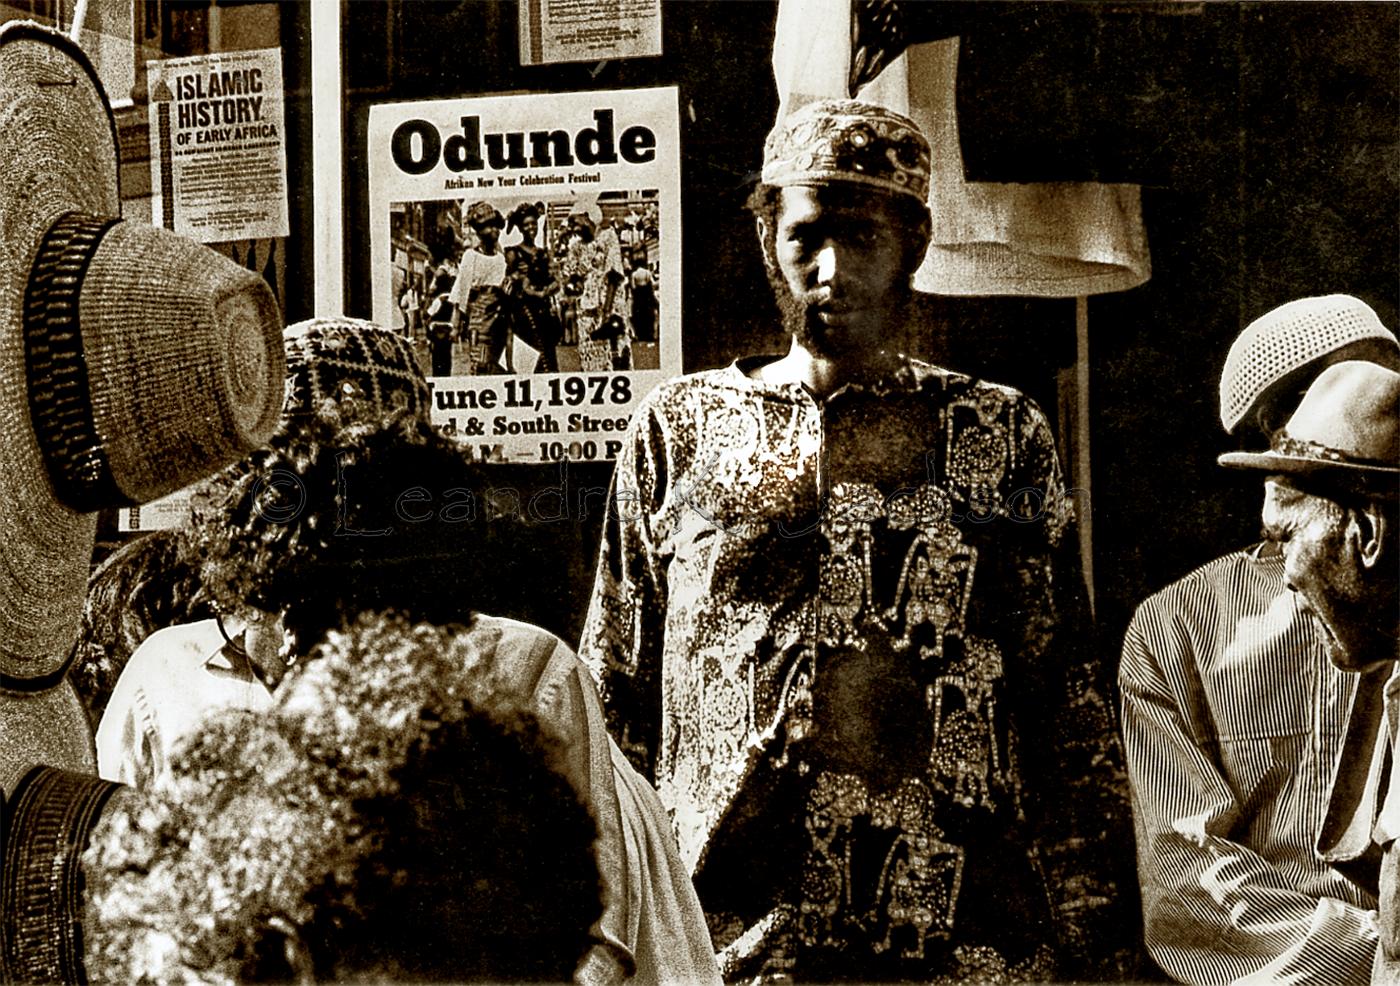 Odunde_1978.png